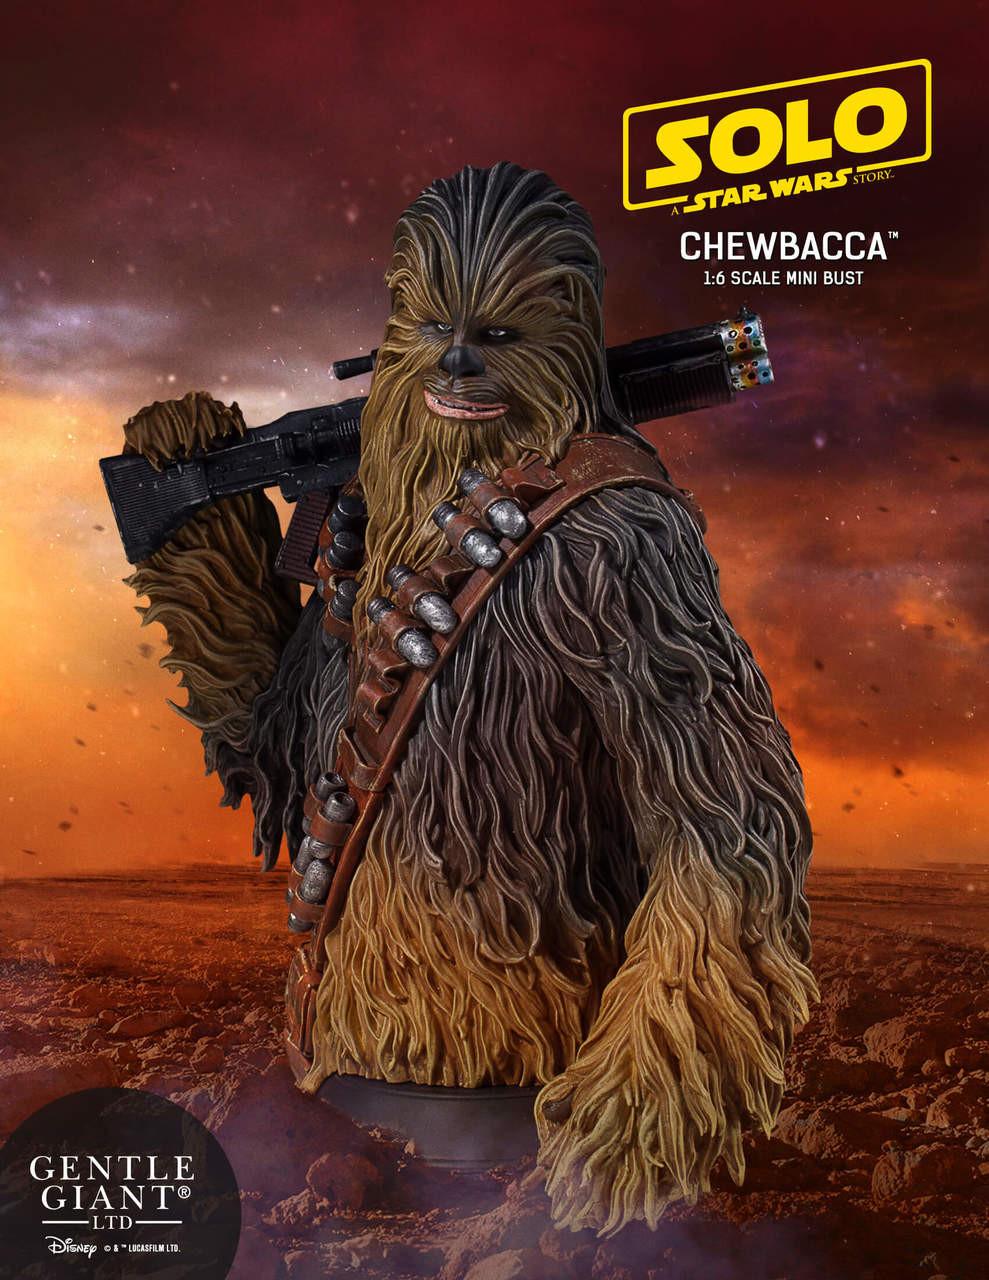 Star Wars Chewbacca Solo